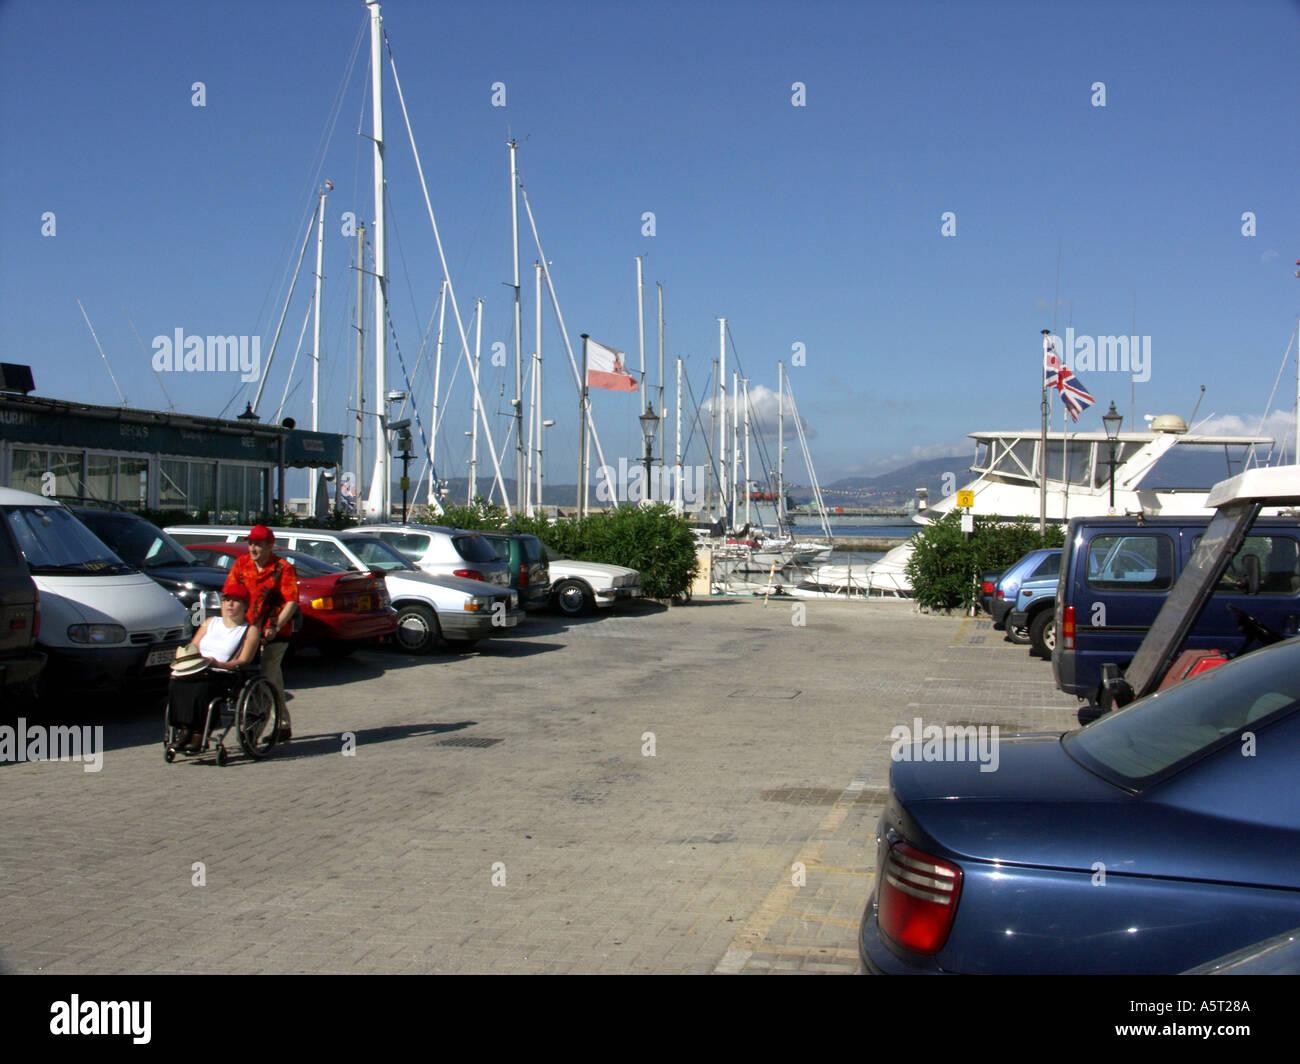 Man Pushing Woman in Wheelchair Queensway Gibraltar - Stock Image